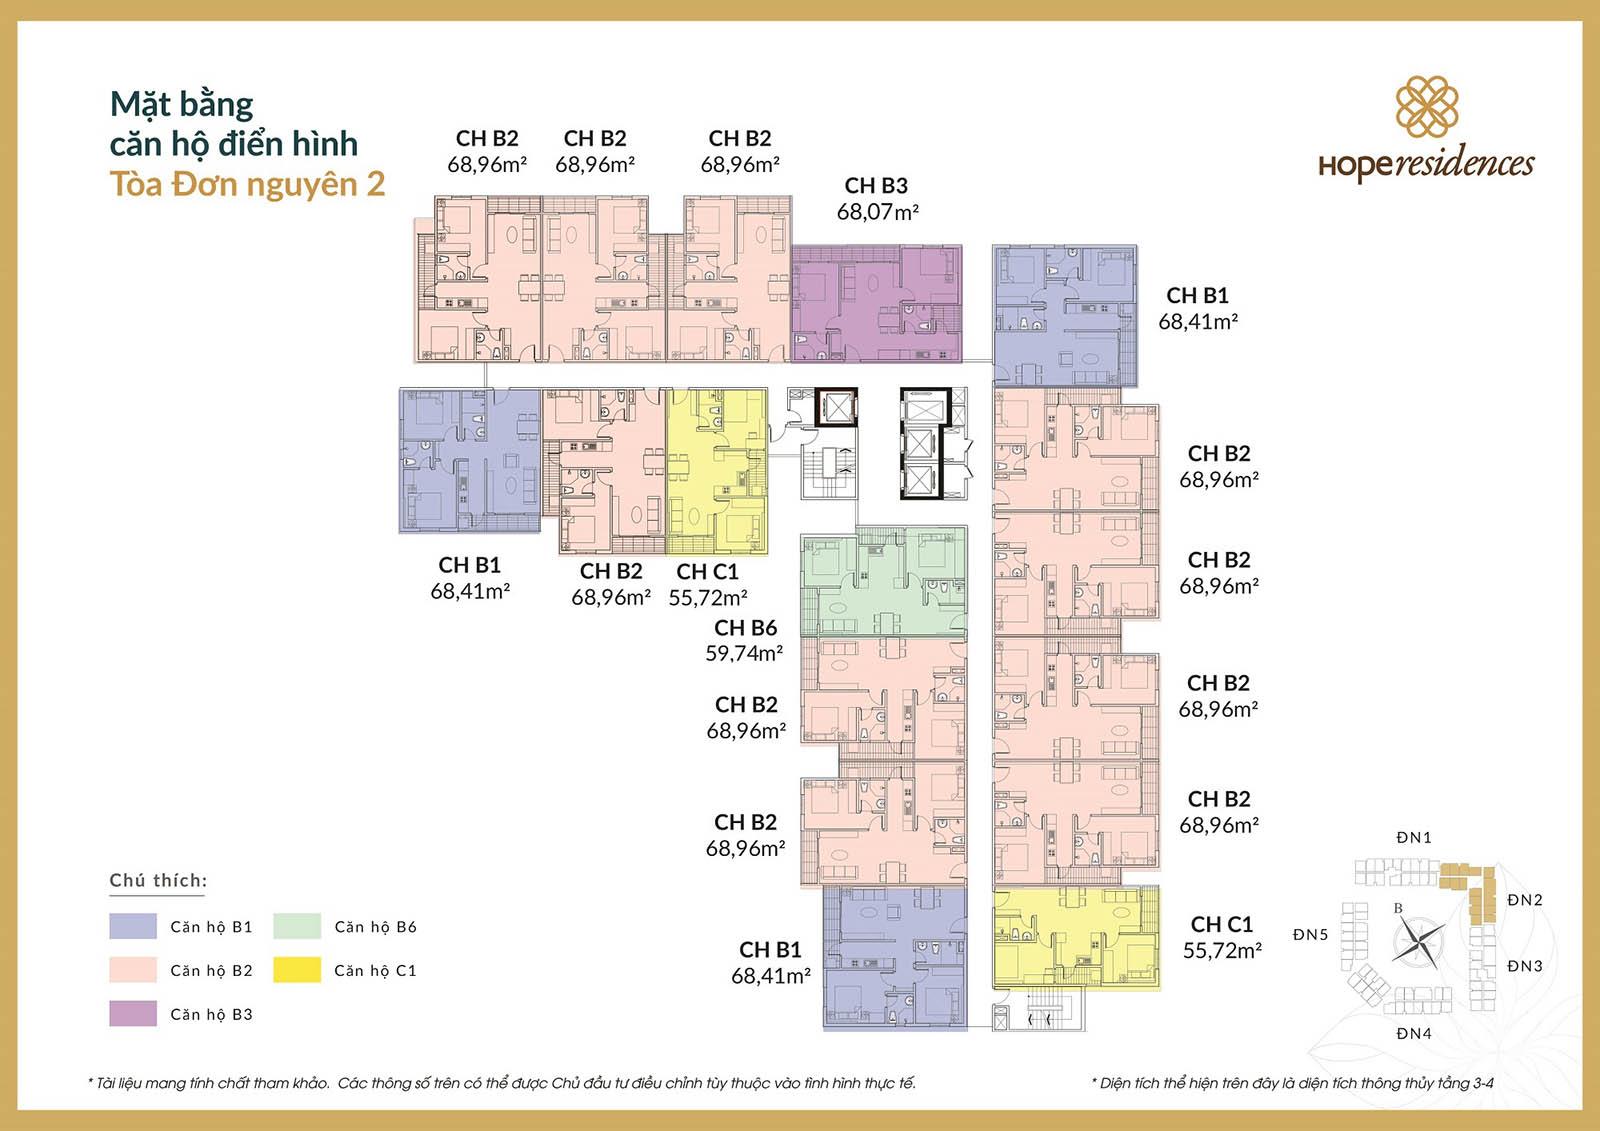 mat-bang-thiet-ke-don-nguyen-2-hope-residences